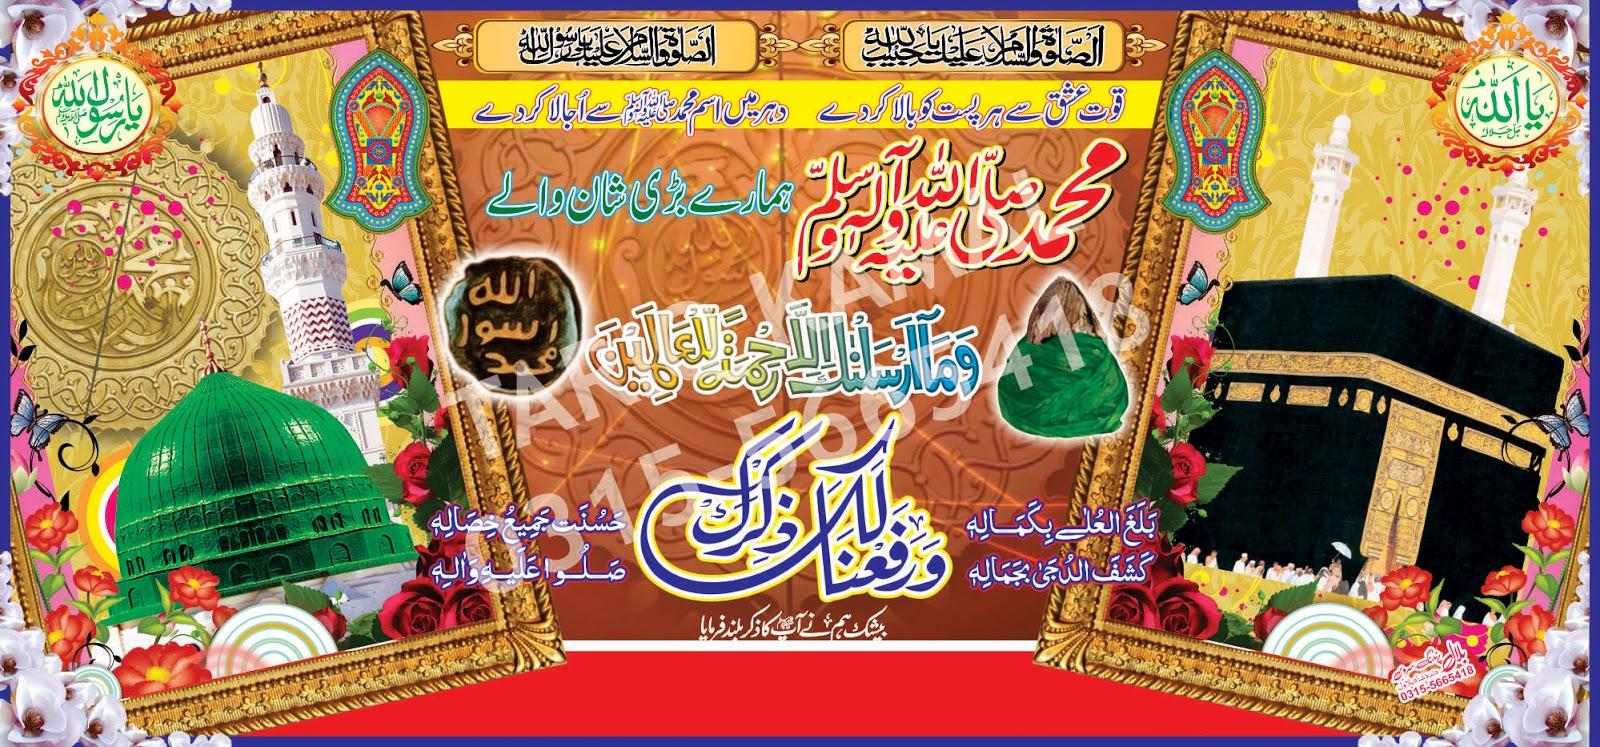 Bilal printing press 12 rabi ul awal design tariqkamal for 12 rabi ul awal decoration pictures